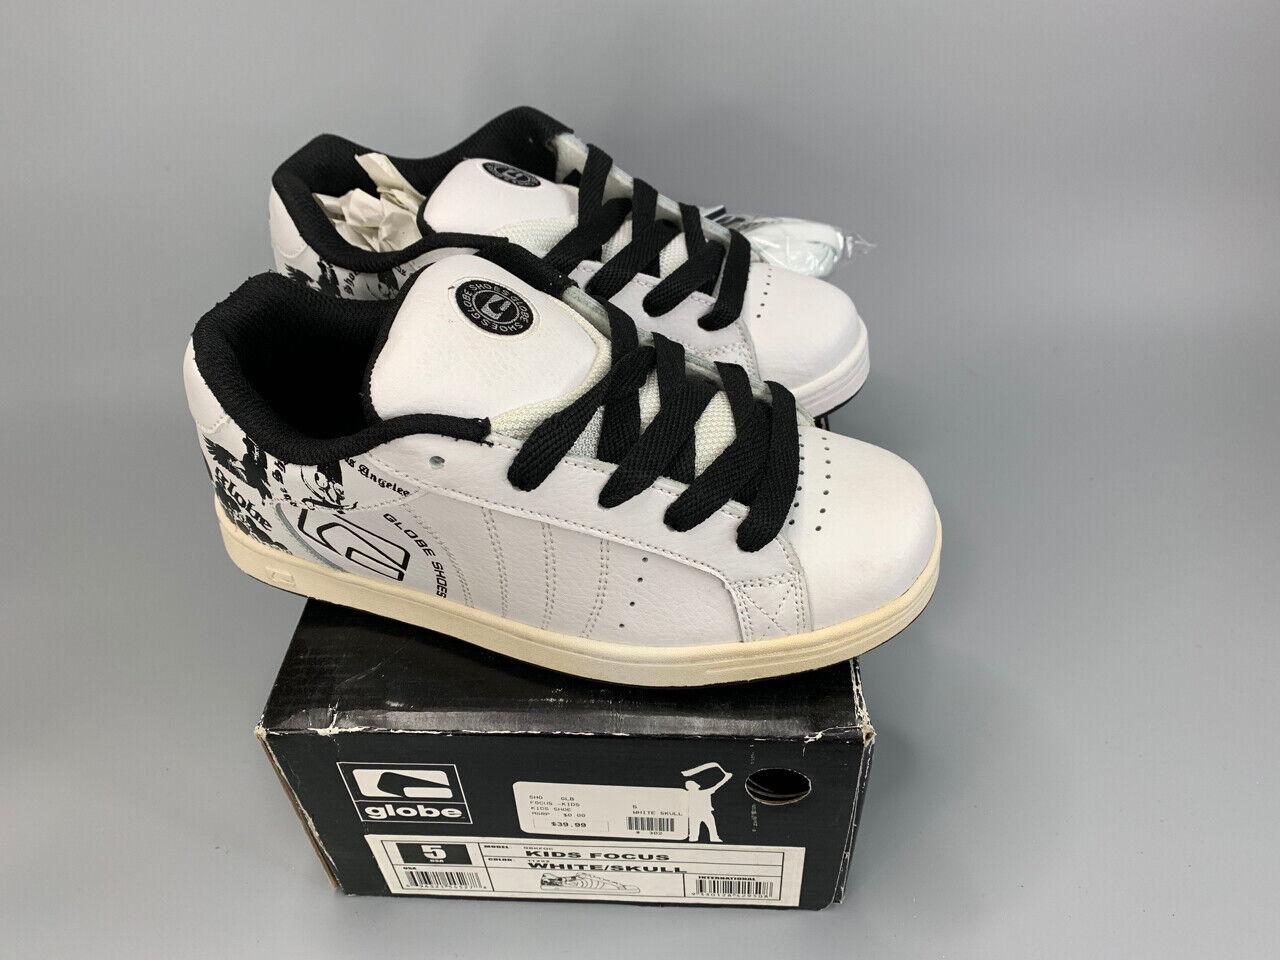 NEW GLOBE FOCUS KIDS Skateboard Skate Shoes Youth Size 5.0 N